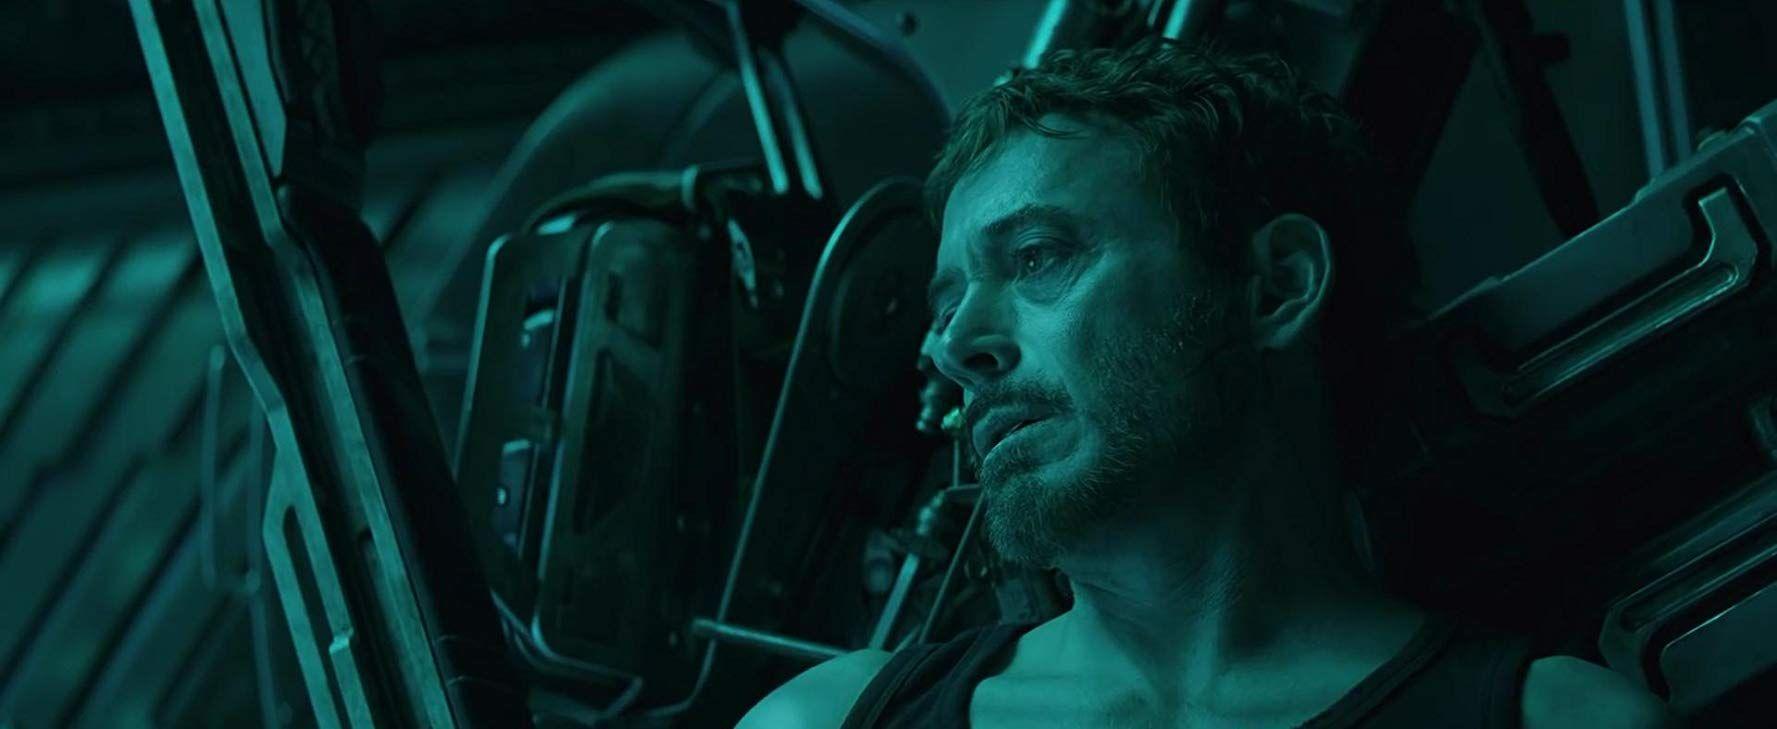 123Movies]-Watch#[{Avengers: Endgame (2019)}]][Full   Movie Online